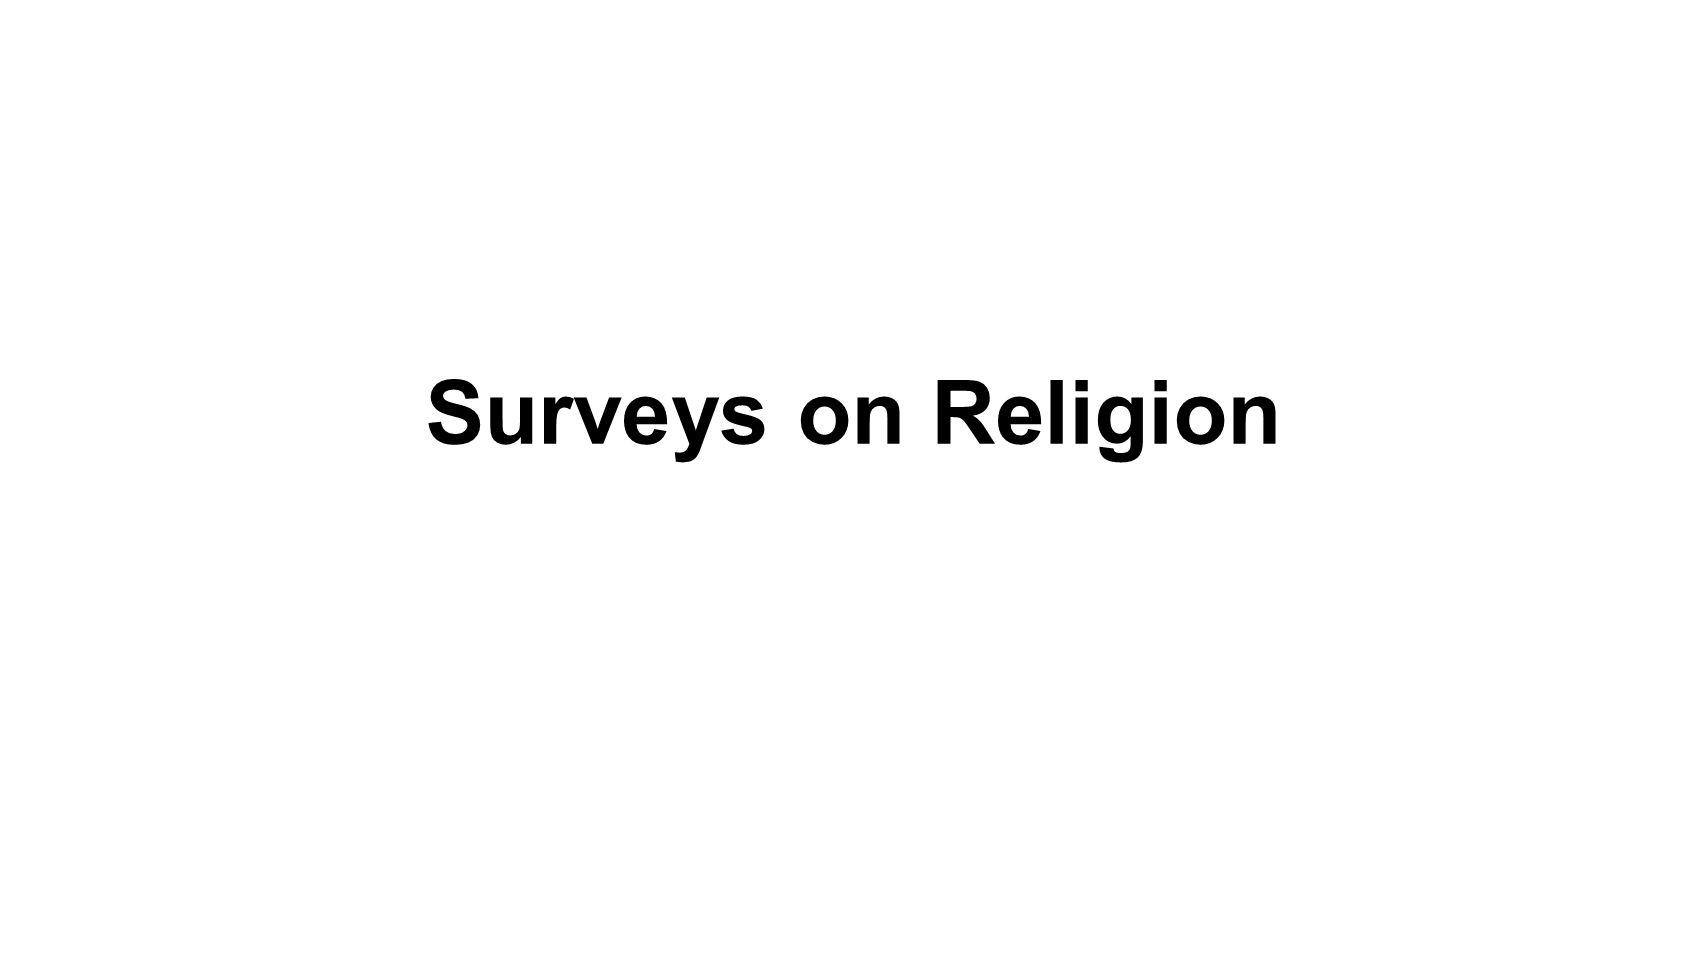 Surveys on Religion